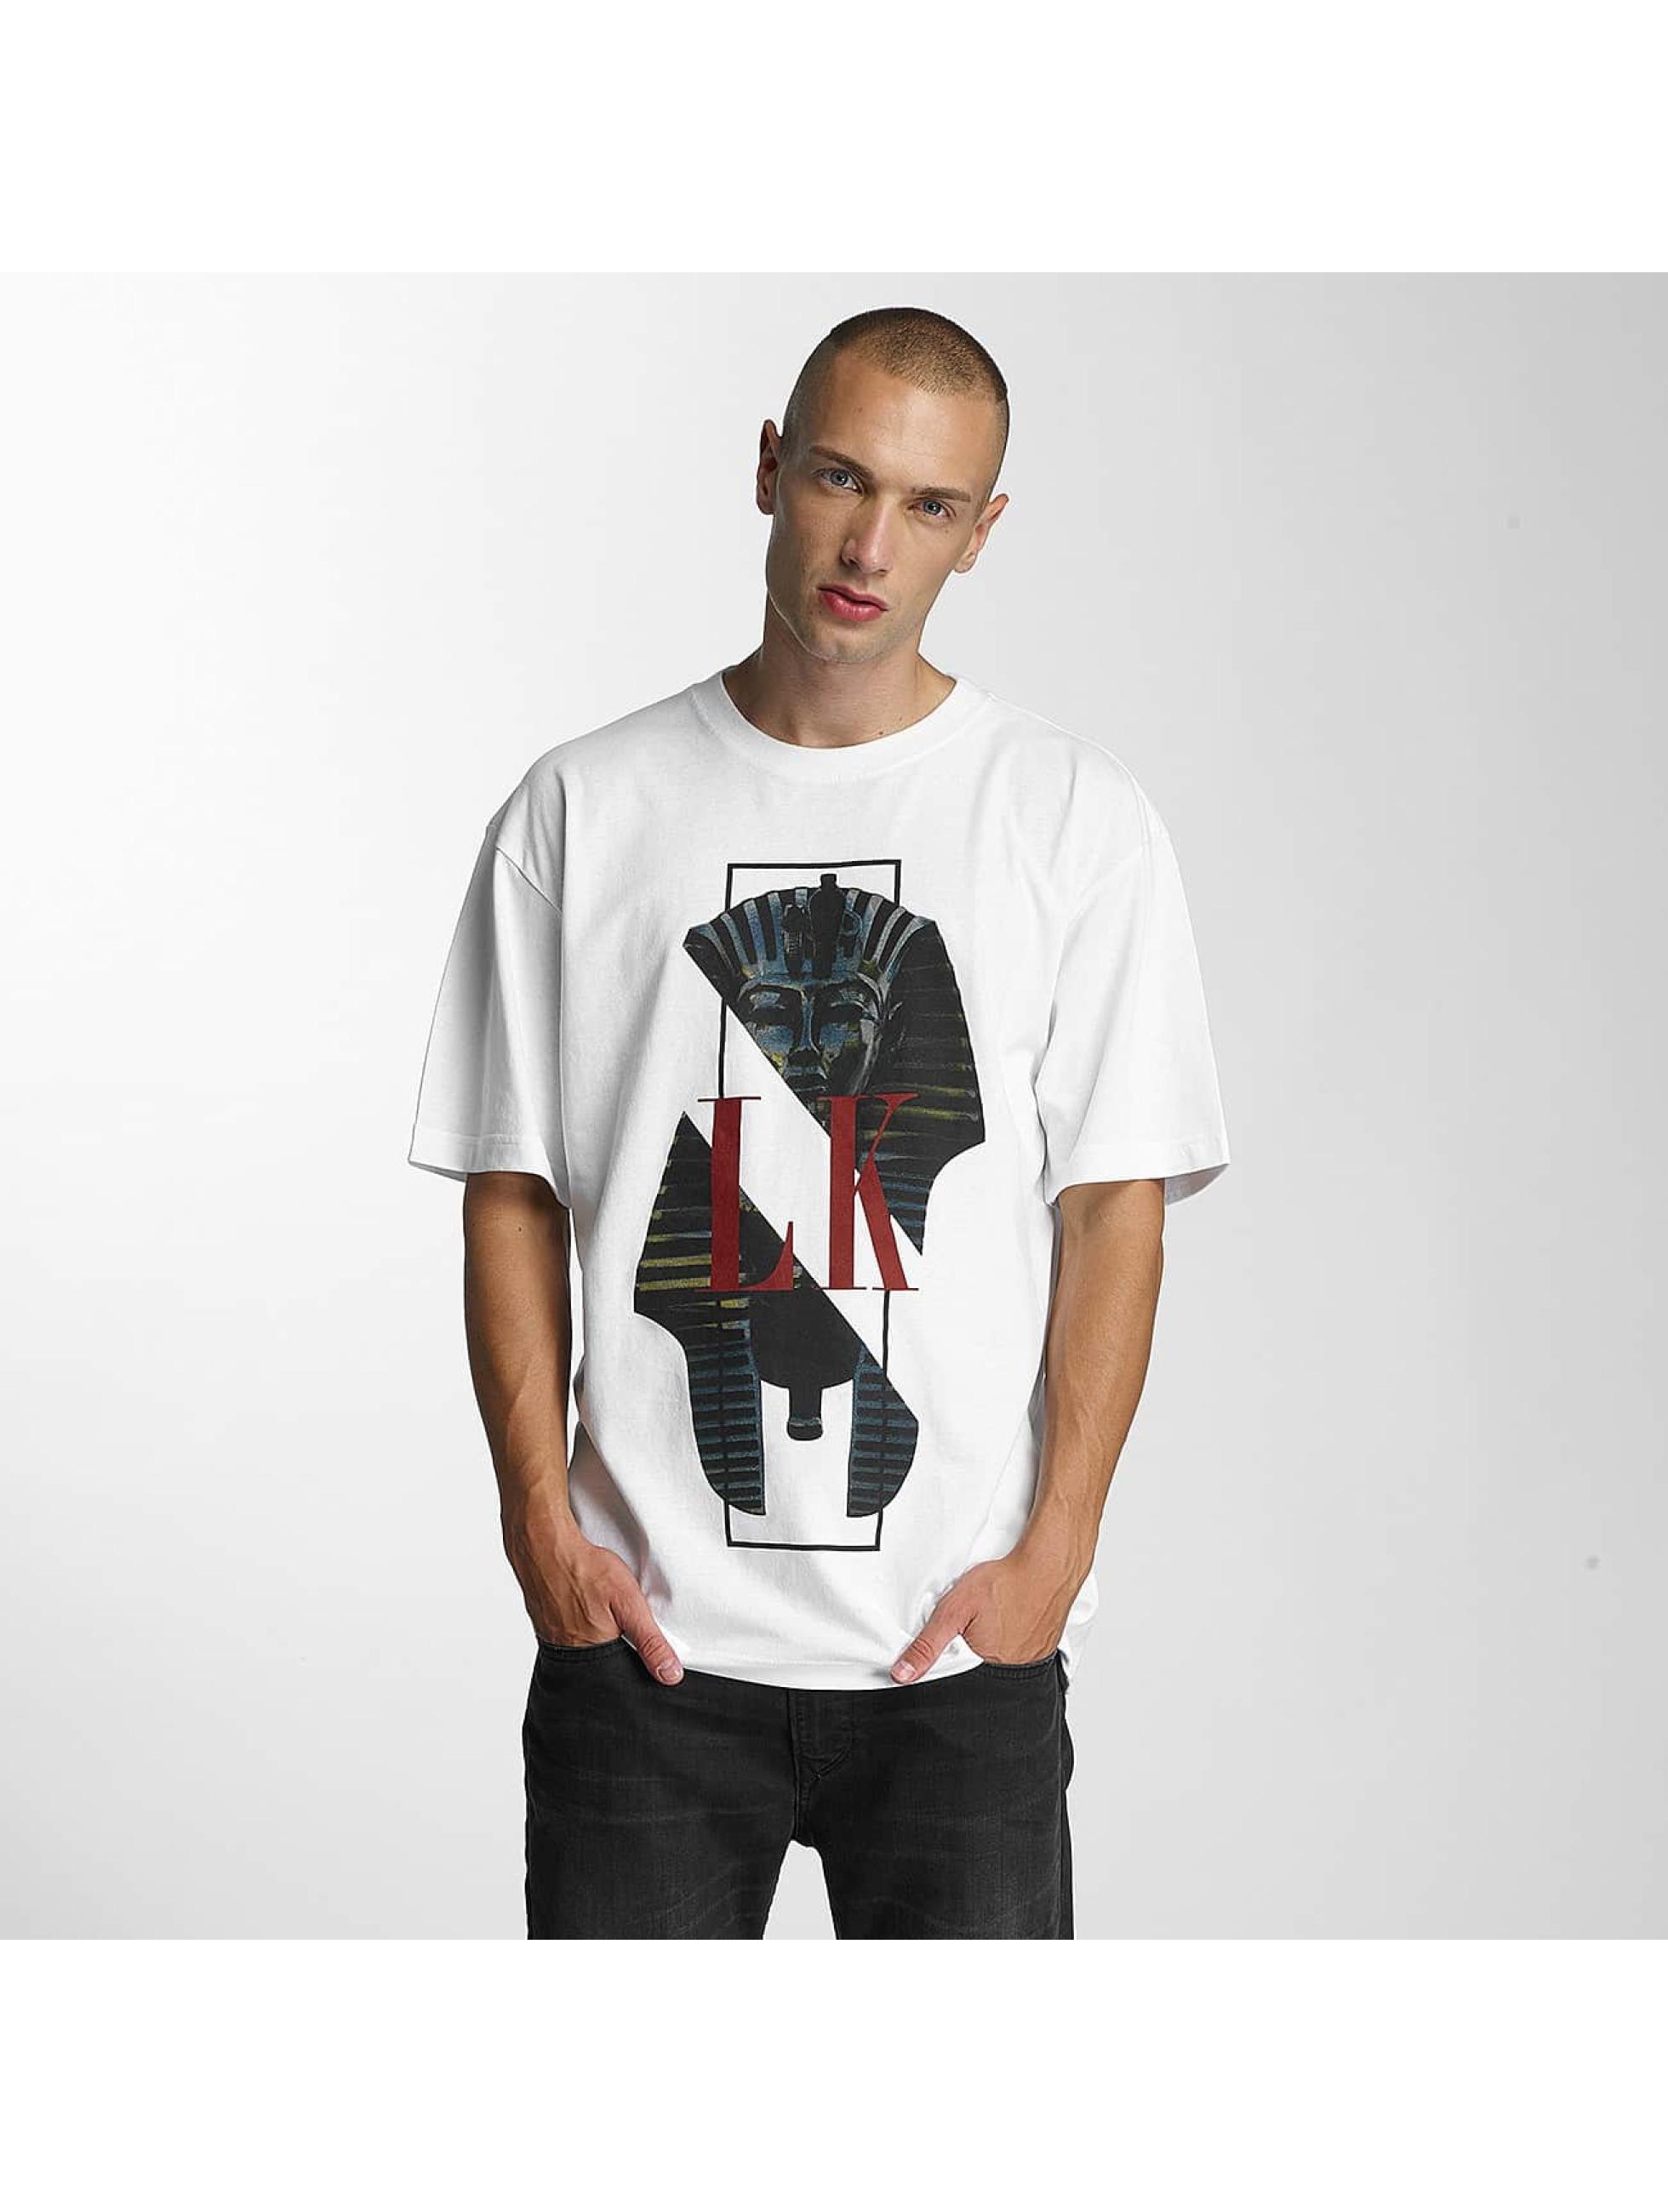 Last-Kings-Uomini-Maglieria-T-shirt-A1